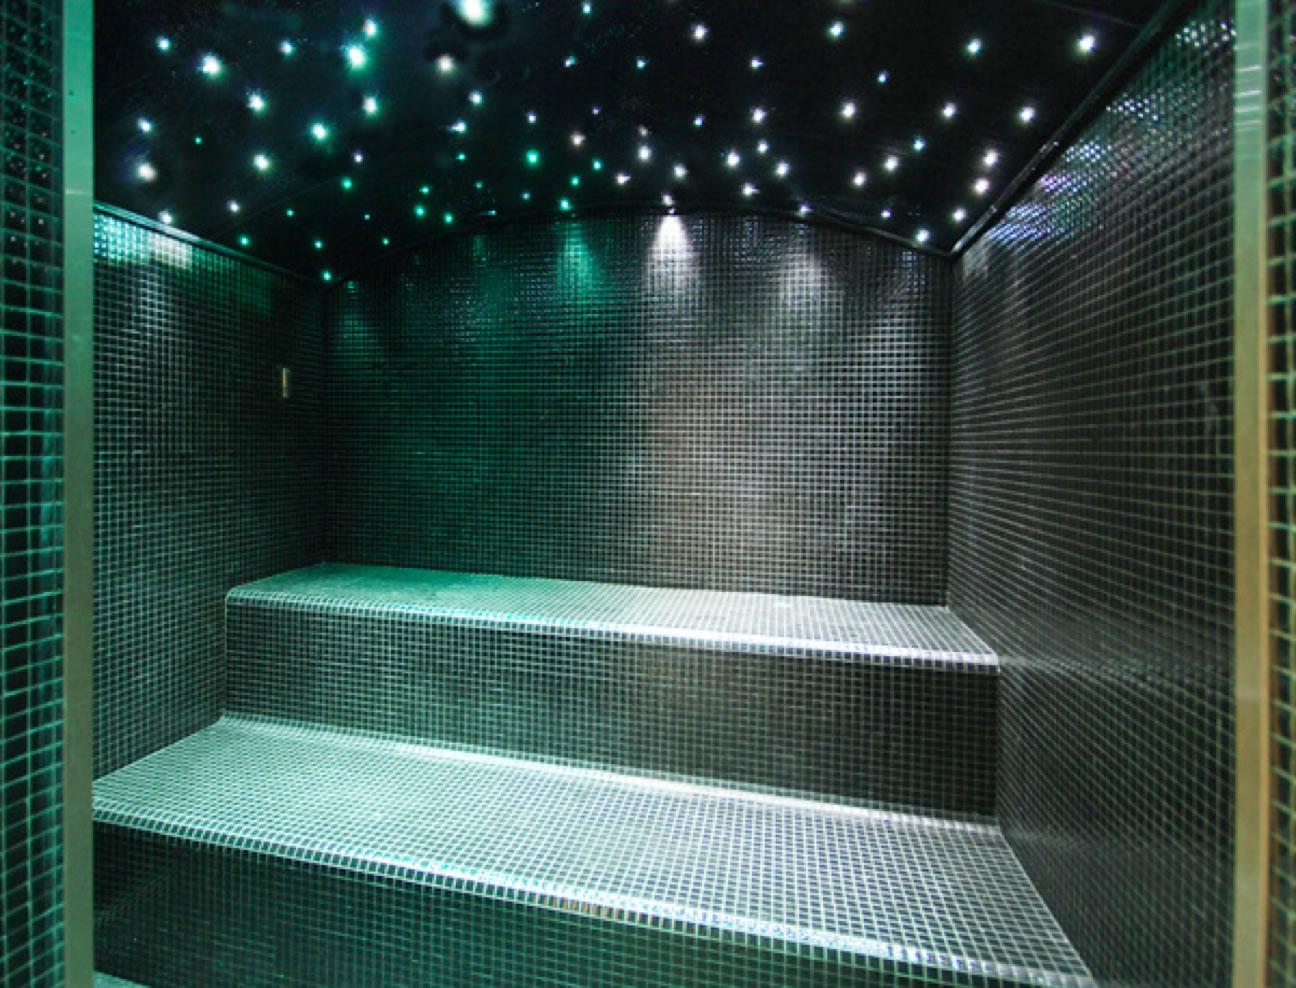 Luci led per bagno turco dream sauna by carmenta piscina bagno